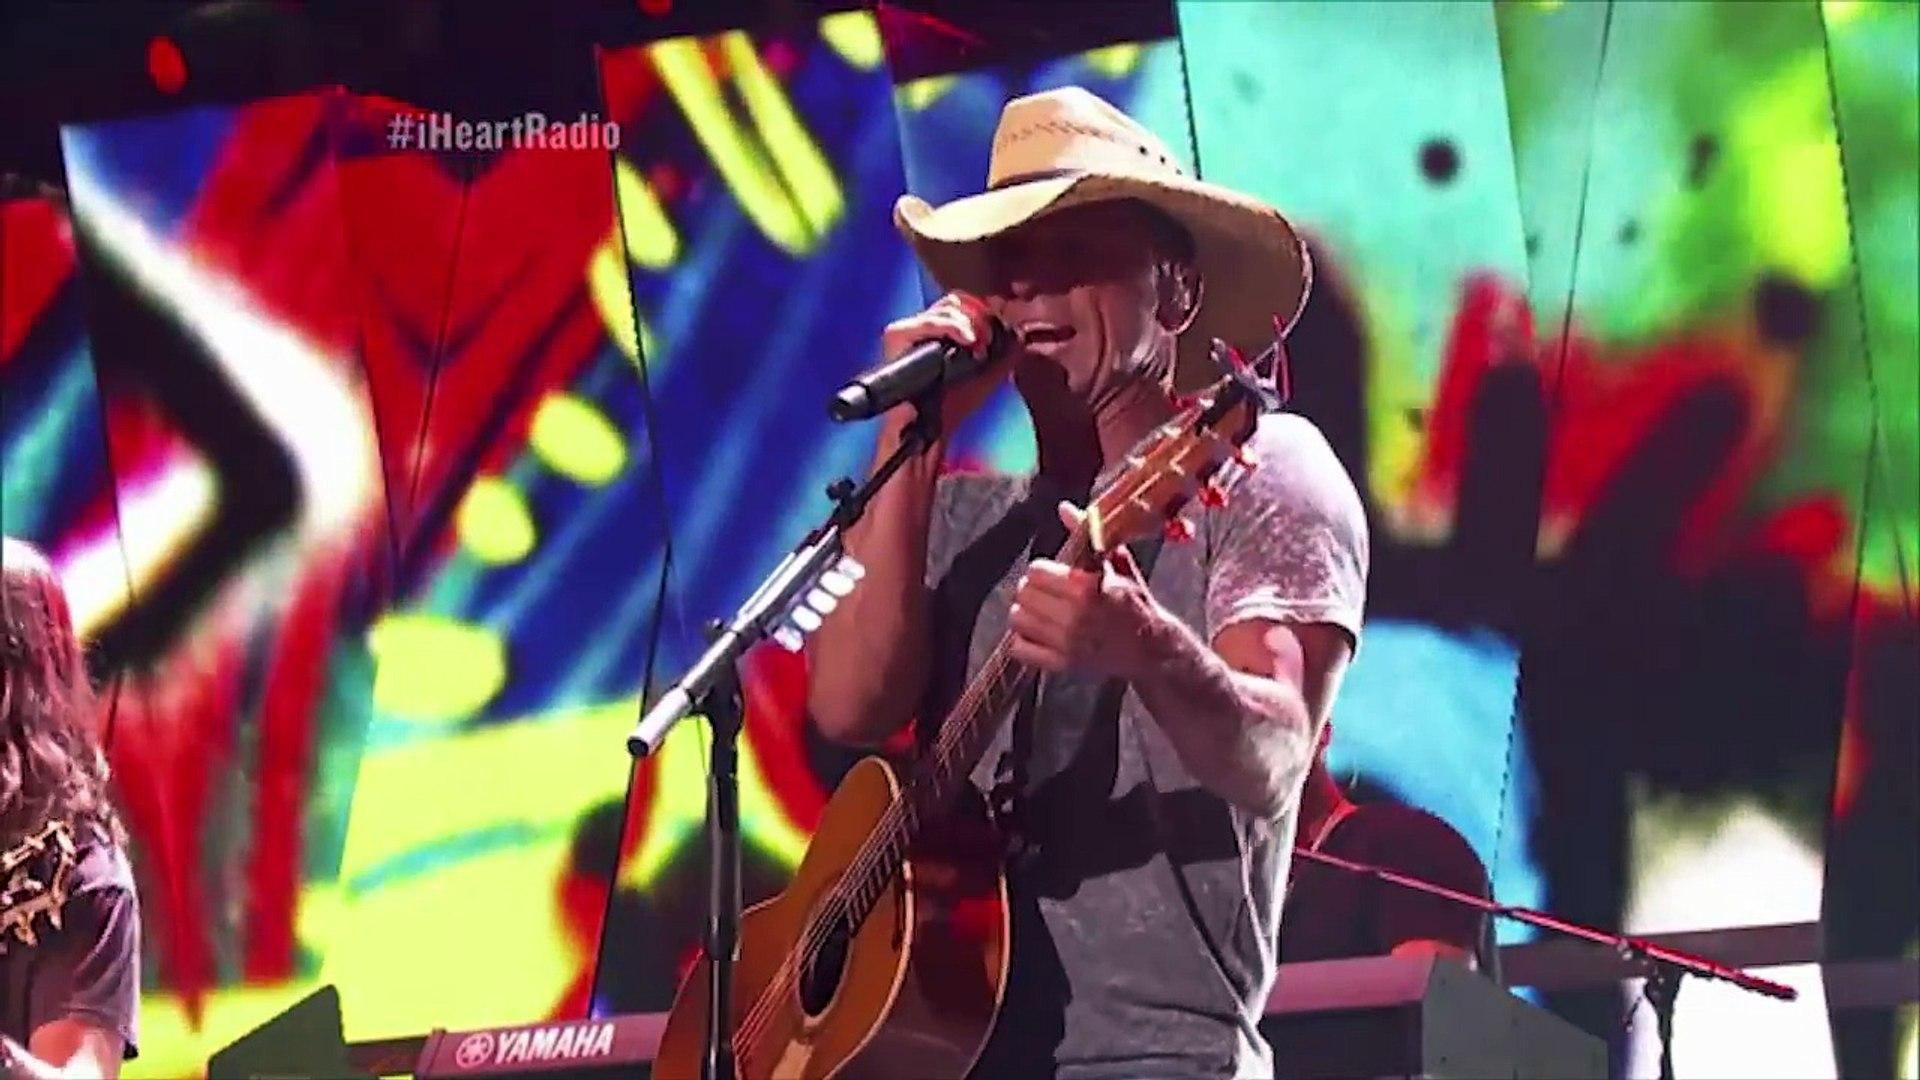 Kenny Chesney - American Kids @ iHeartRadio Music Festival 2015